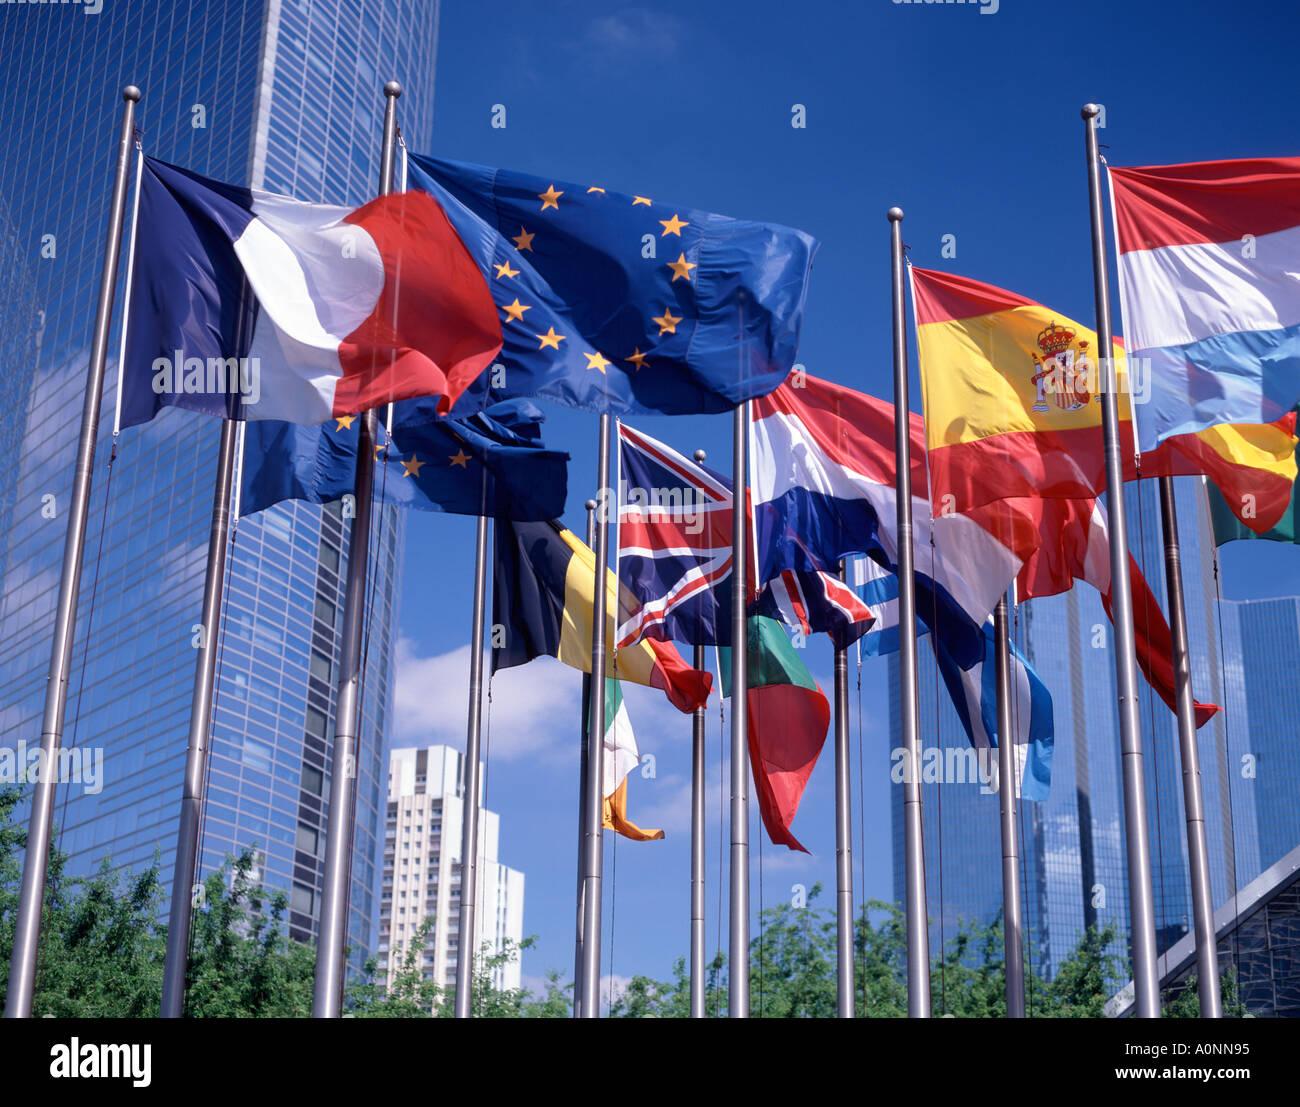 Europäische Union Flaggen, La Défense, Paris, Frankreich Stockbild